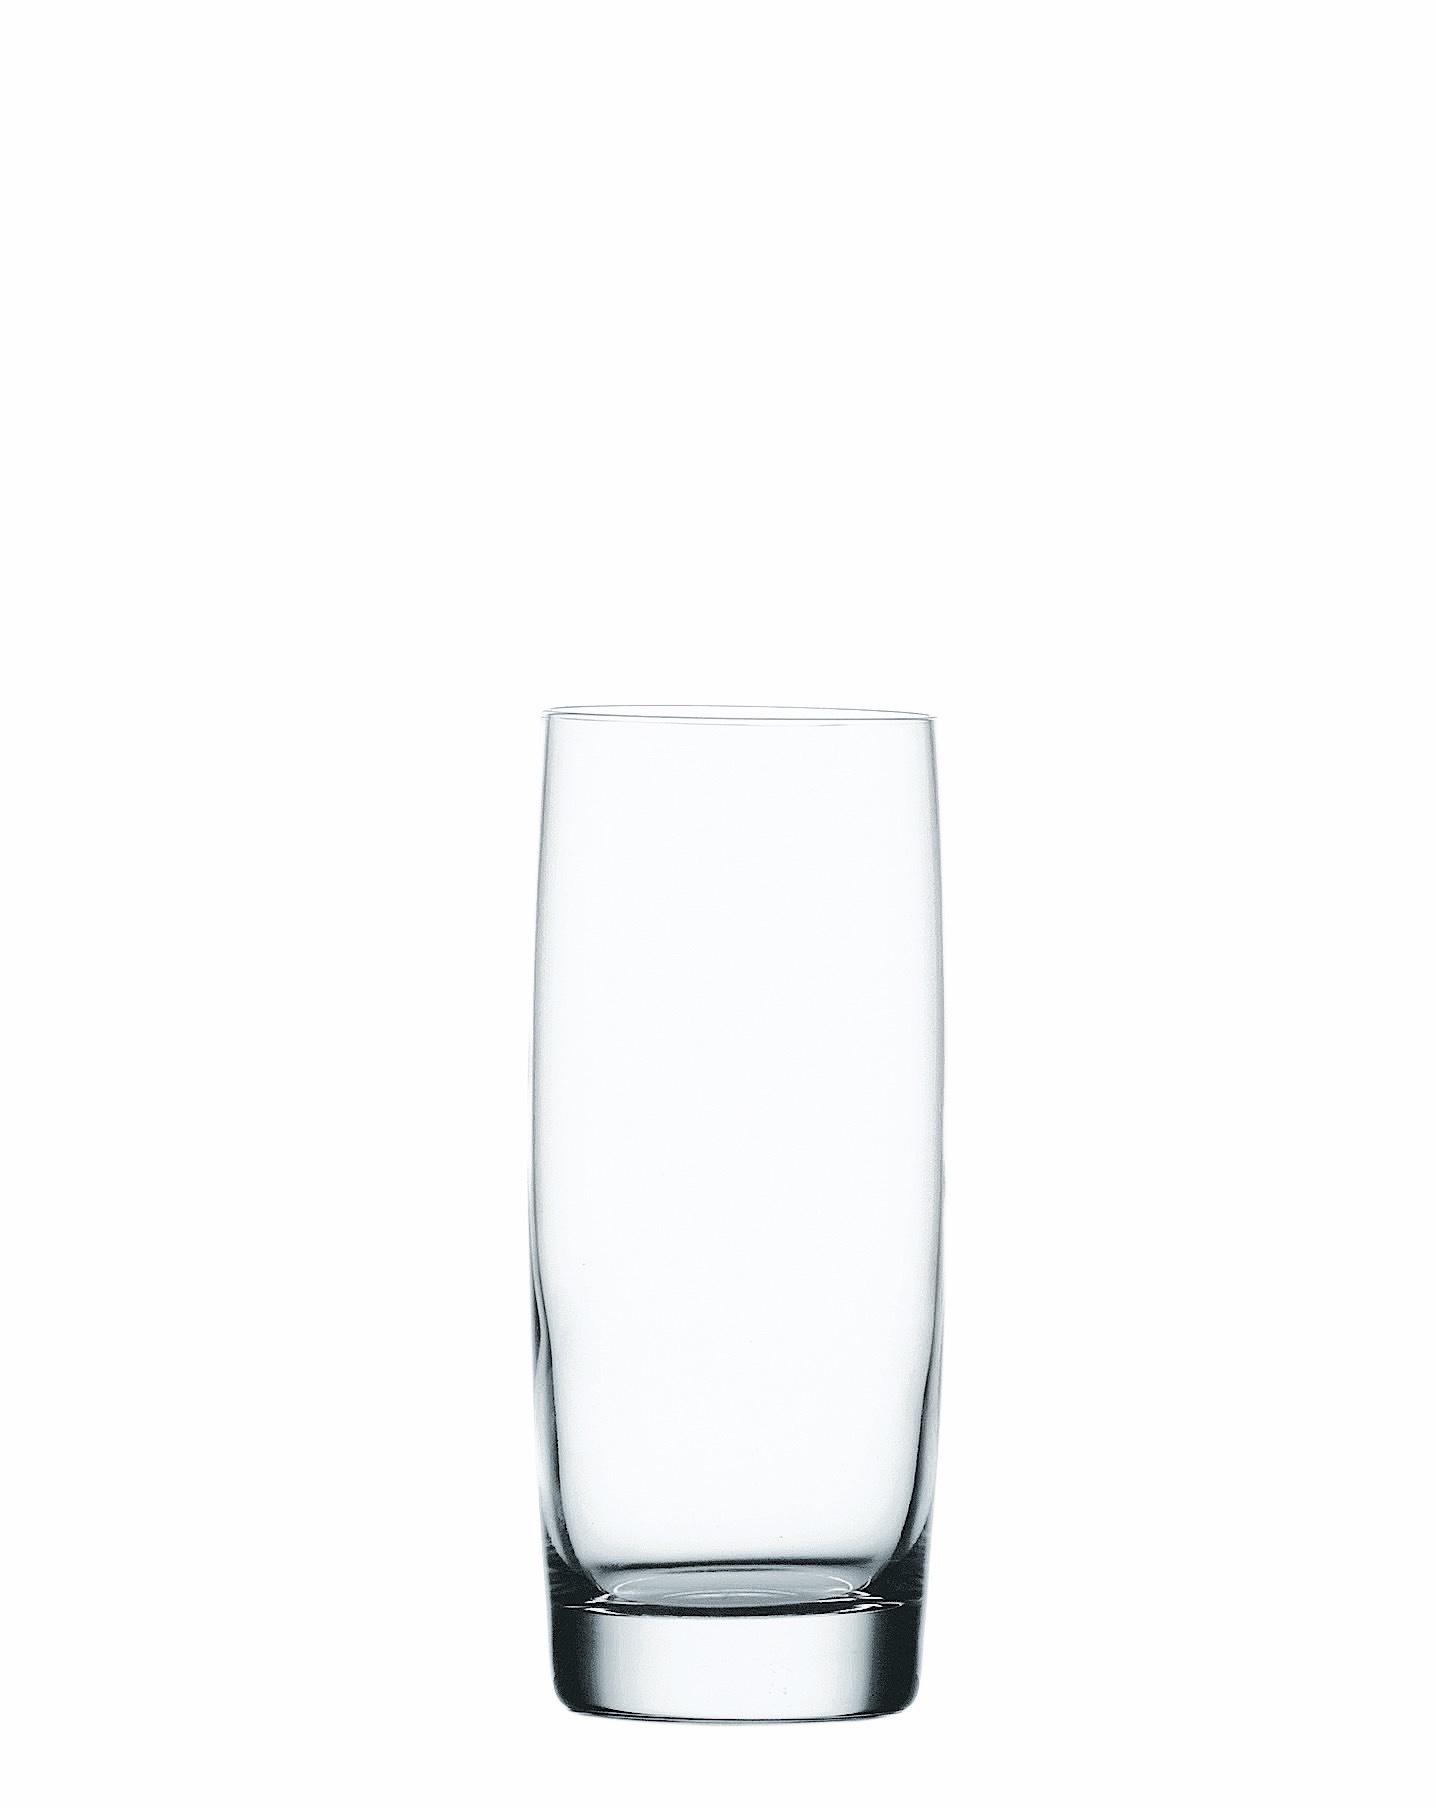 Набор из 4-х бокалов Longdrink Vivendi Premium, 413 мл набор из 4 х бокалов для крепких напитков stemmed spirit vivendi premium 109 мл